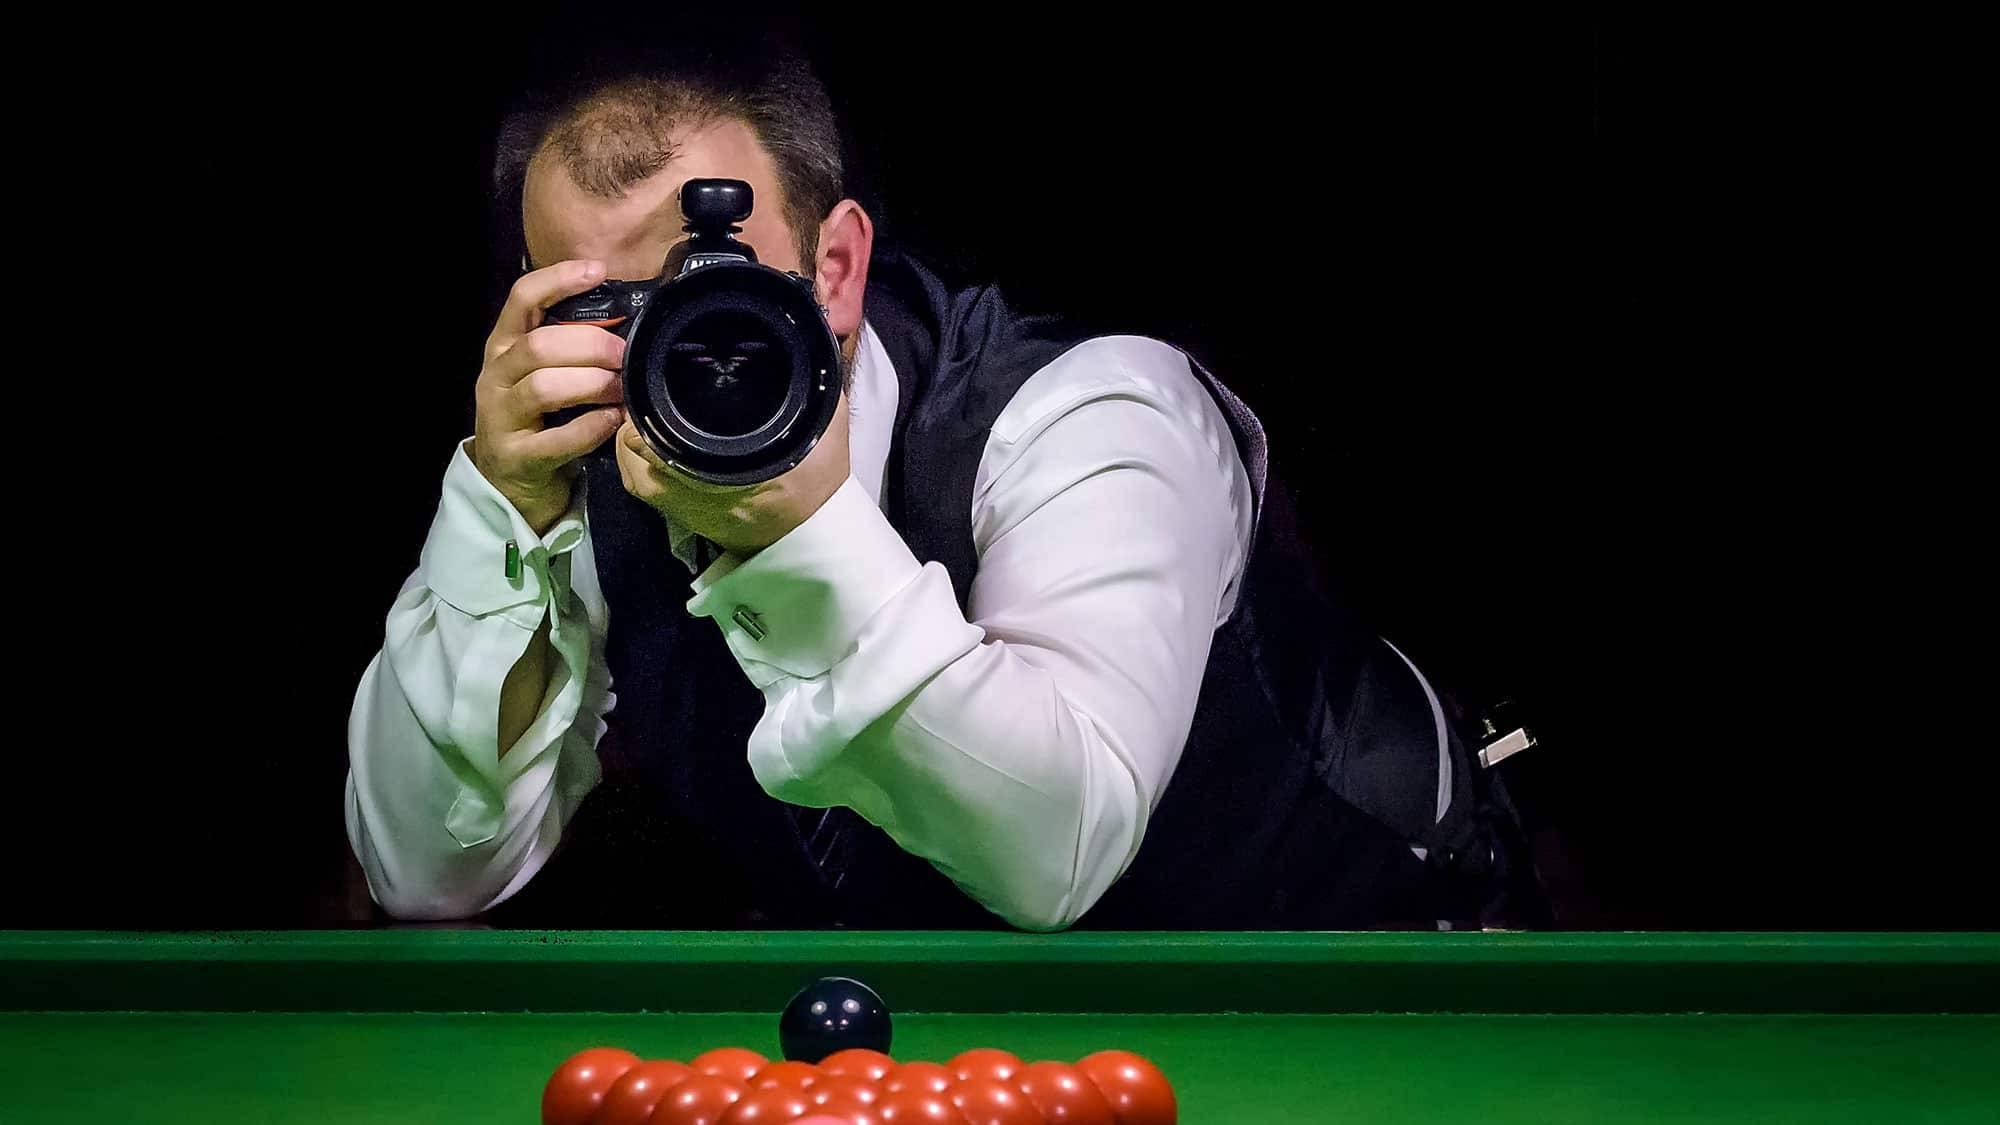 Taunton Photographer